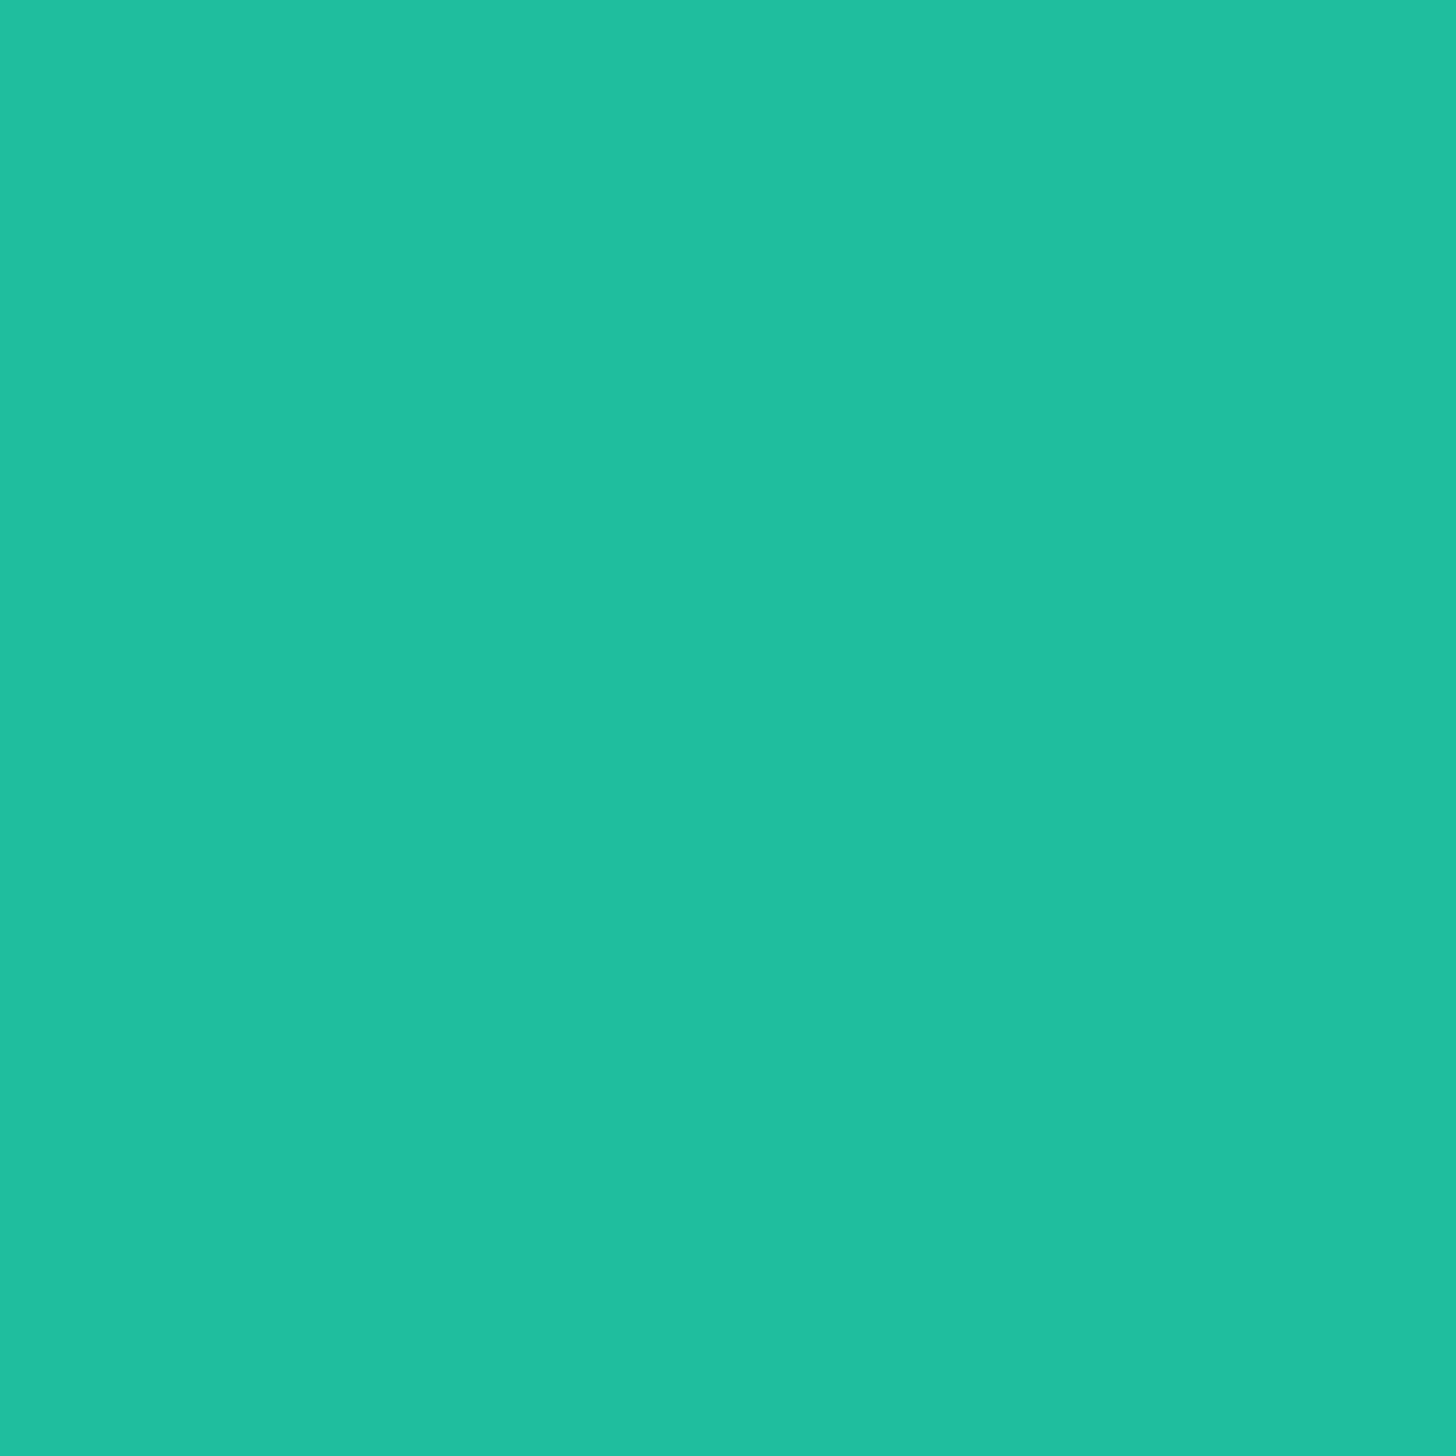 sq_green